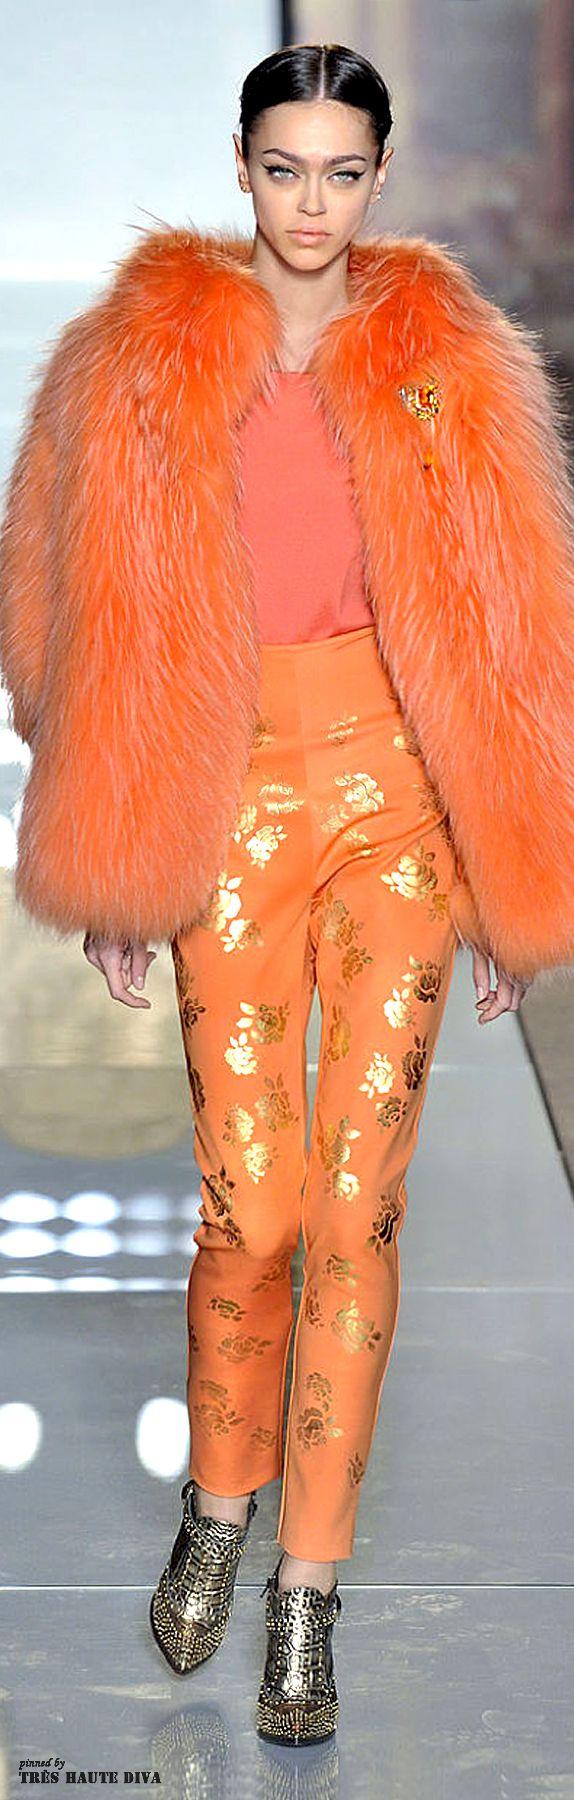 Roccobarocco Fall/Winter 2014 http://fashion.manysales.ru/Roccobarocco/ #Roccobarocco #fashion #collection//.......~IaM~